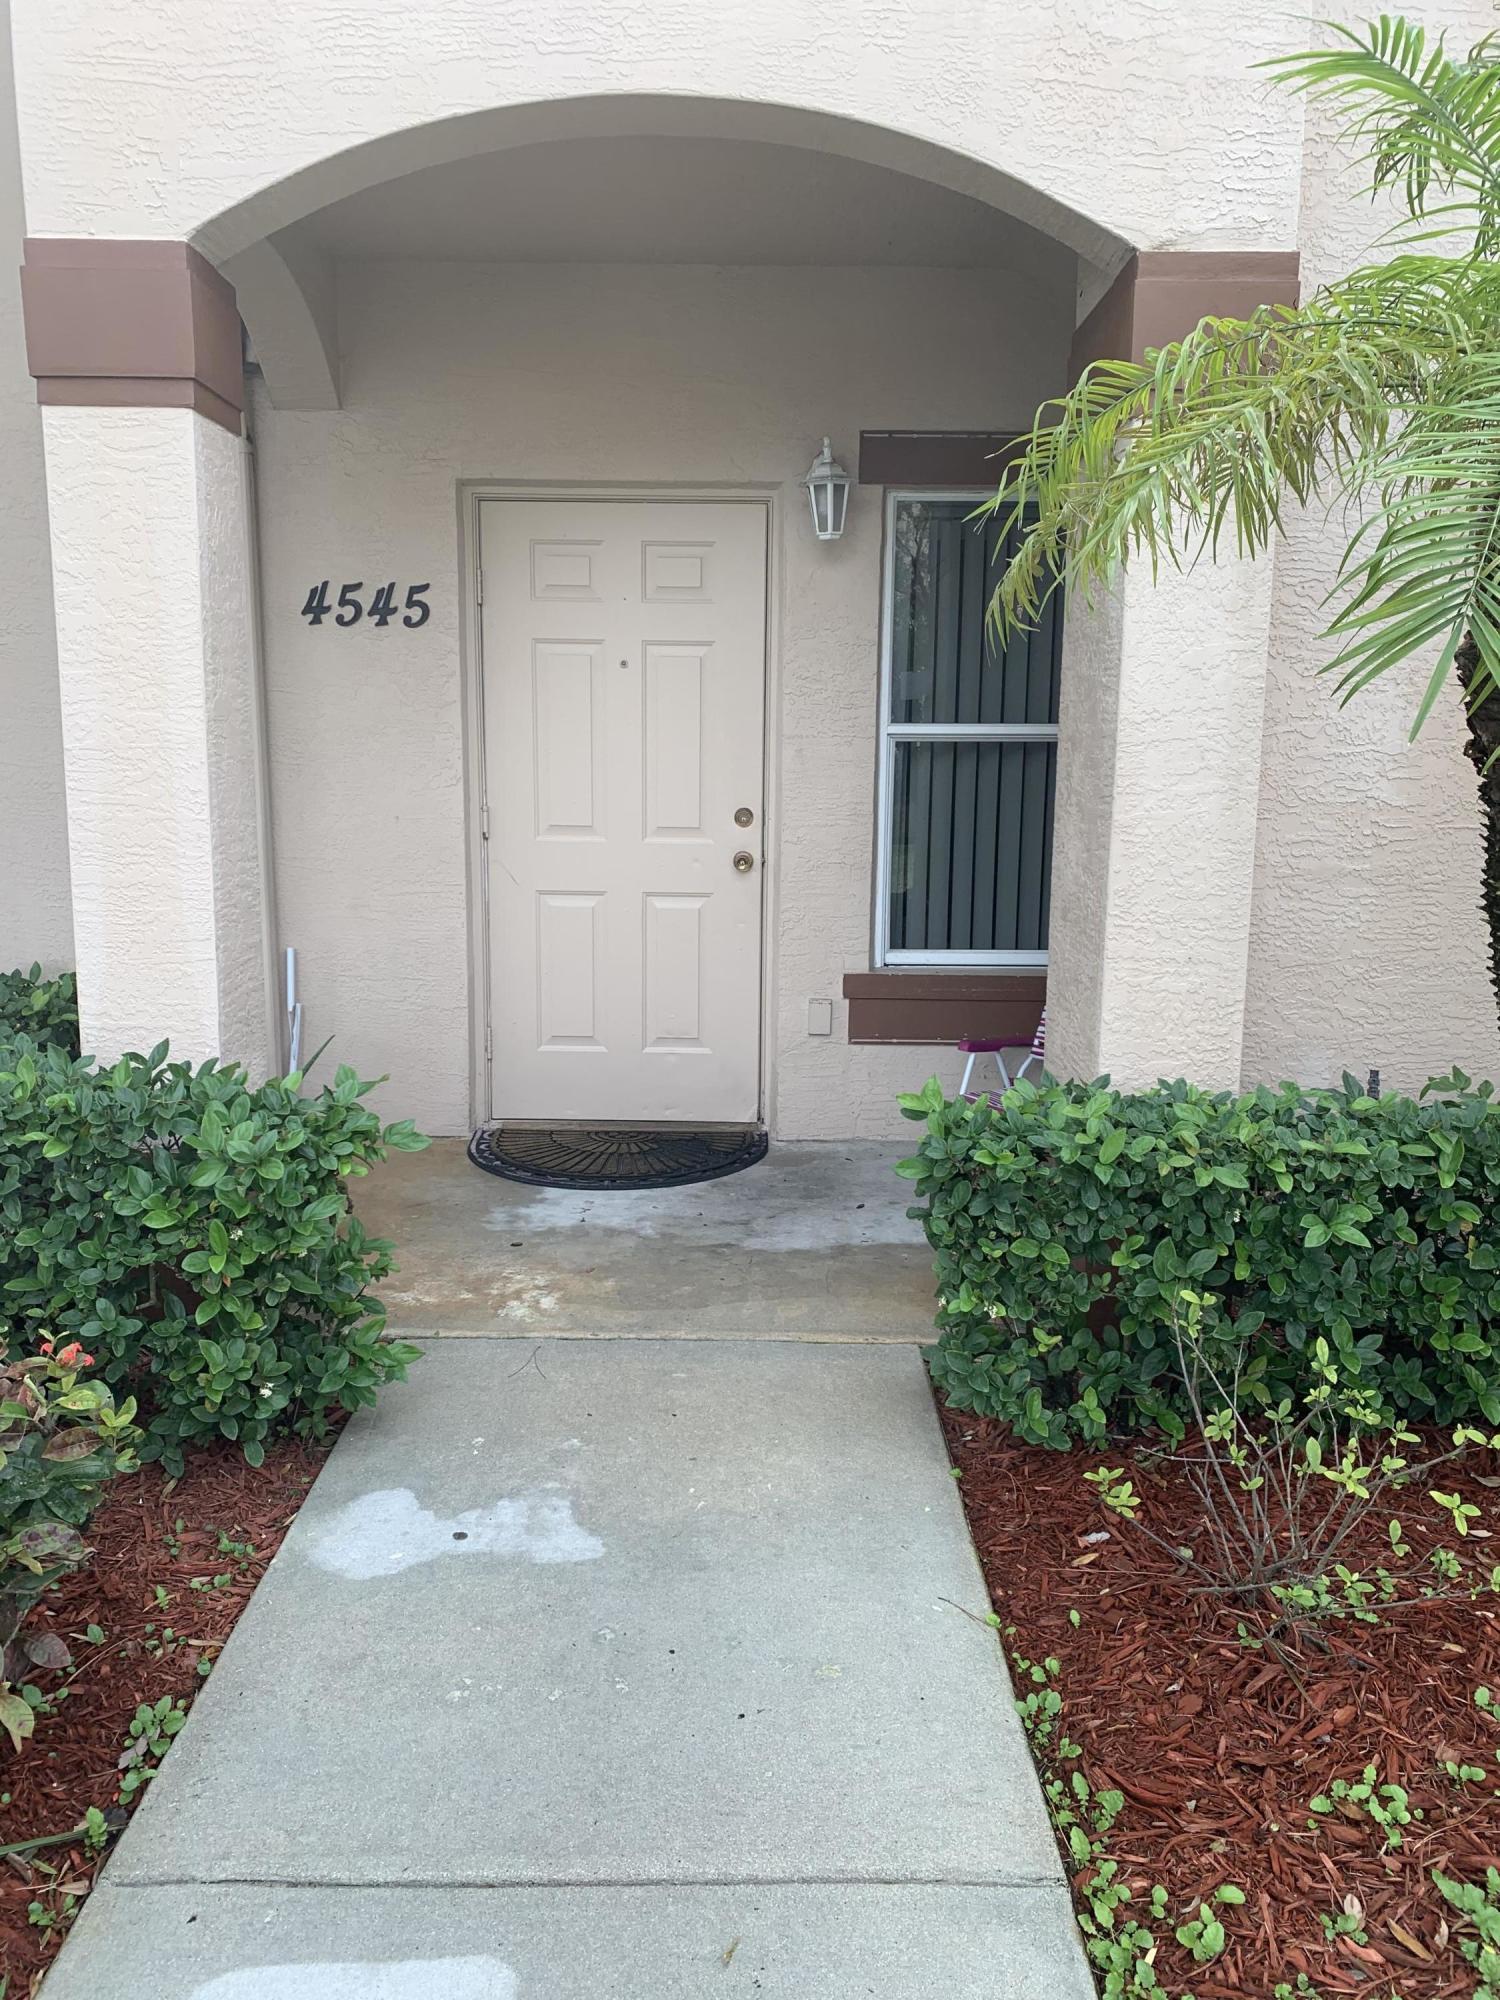 4545 Oak Terrace Drive #4545 - 33463 - FL - Greenacres